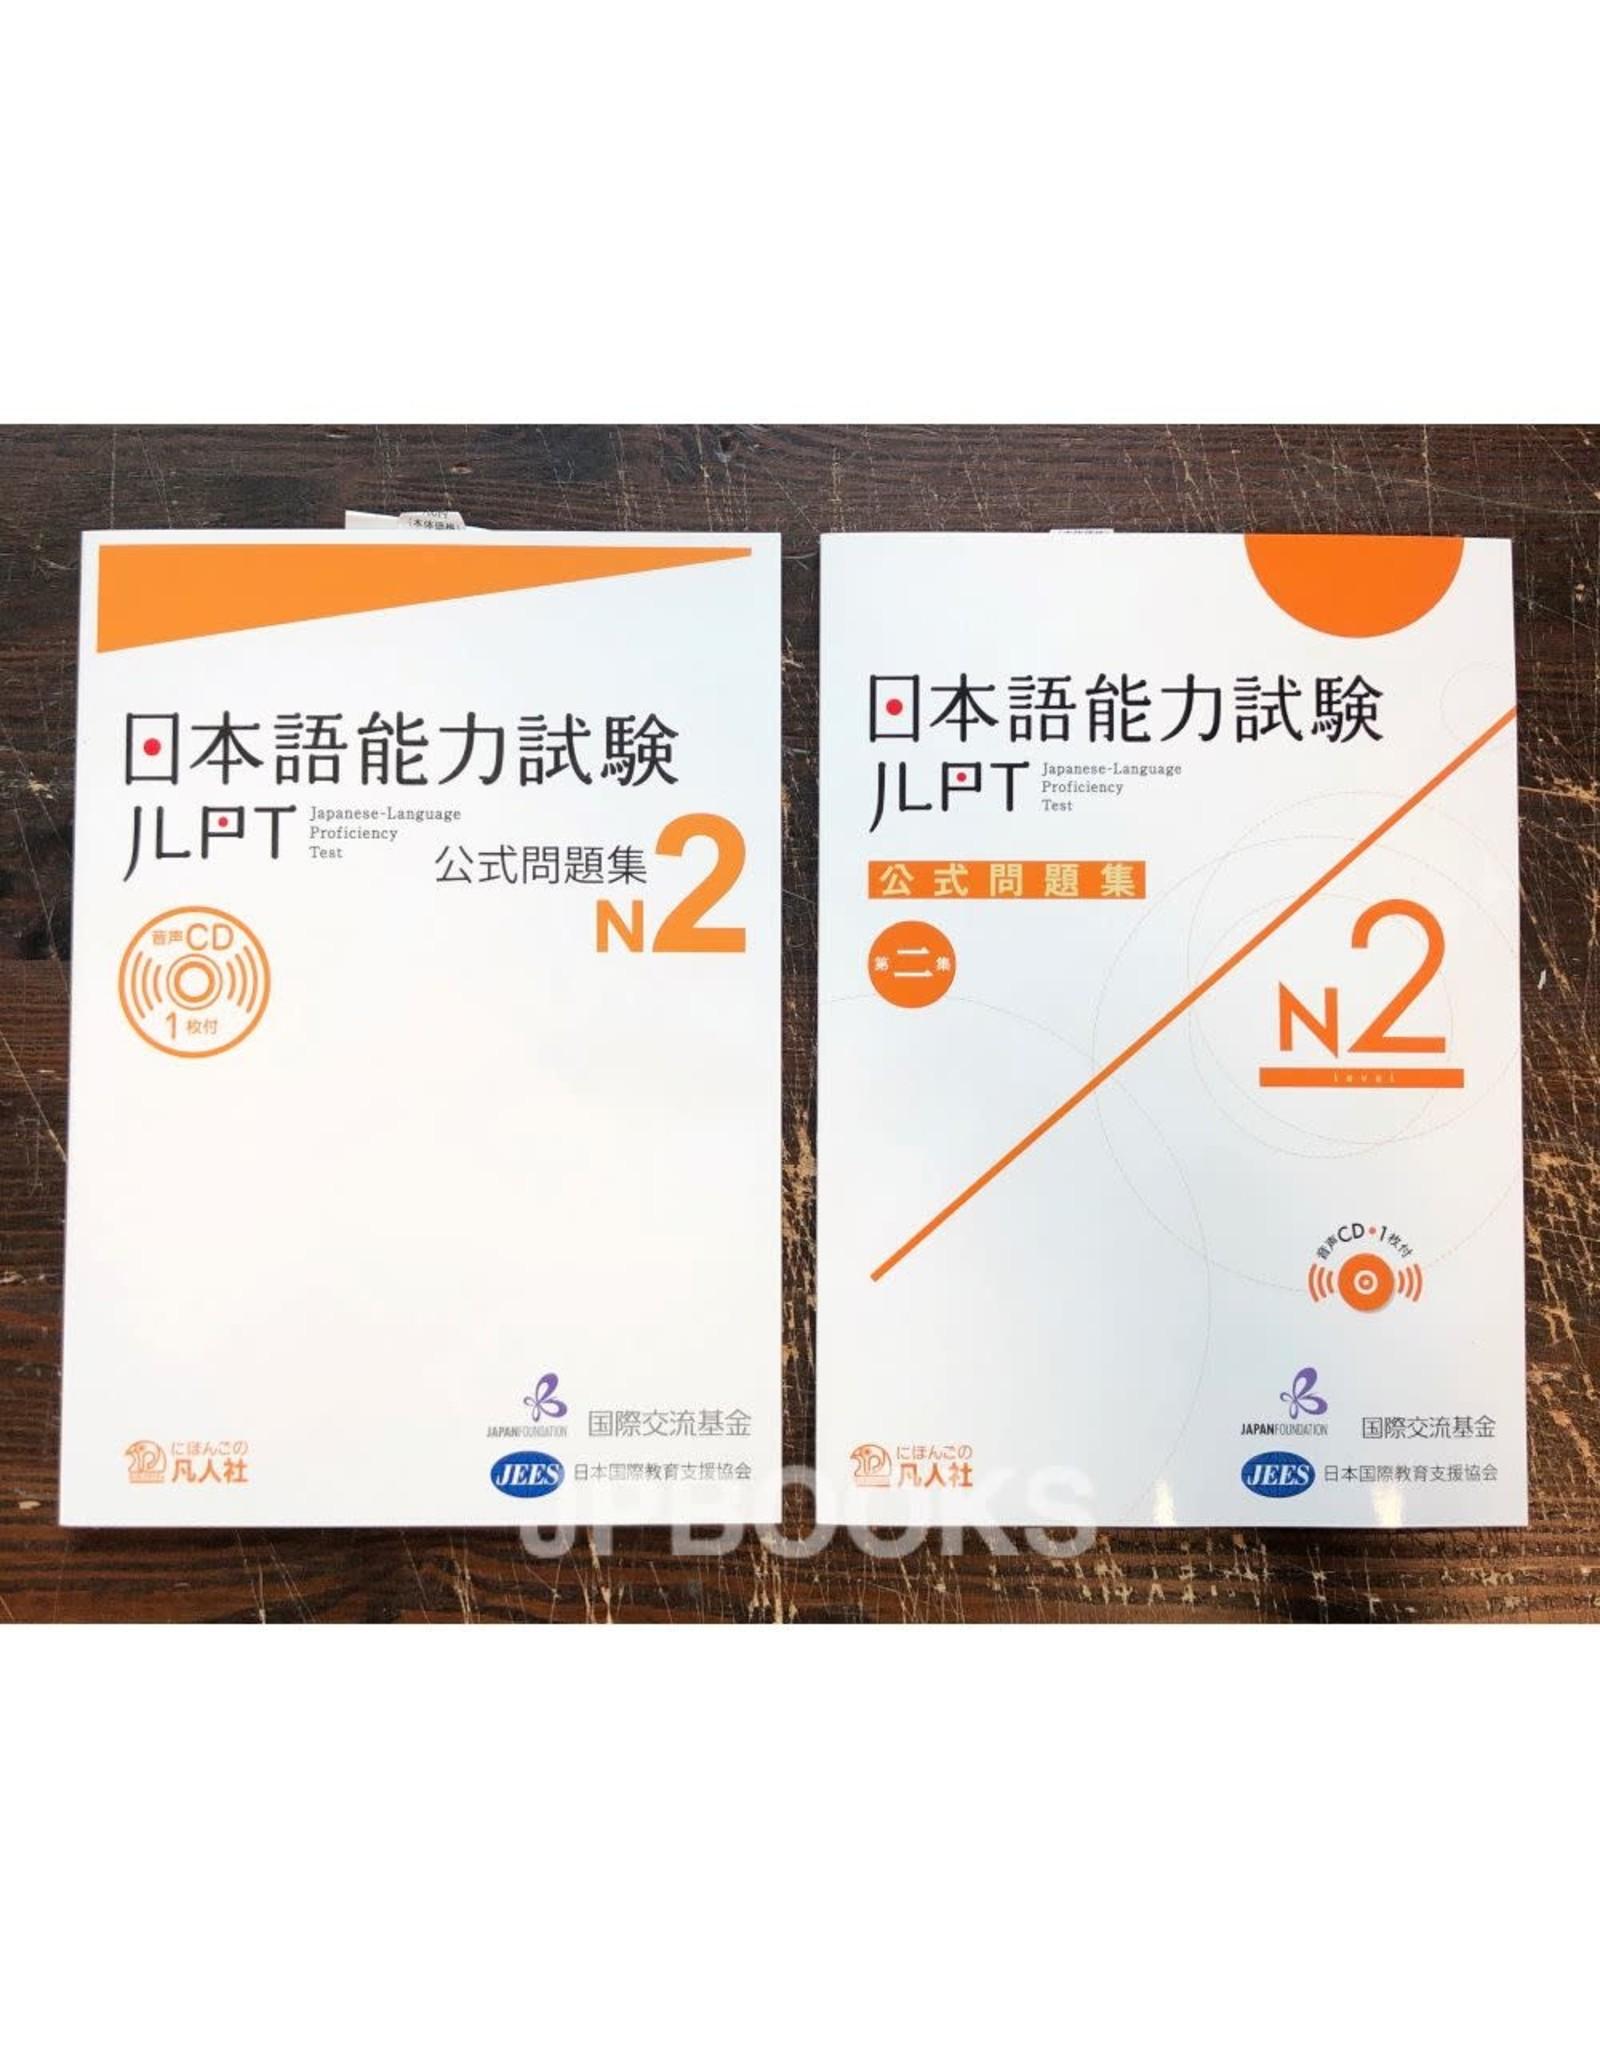 BONJINSHA JLPT KOSHIKI MONDAISHU N2 SET ( VOL.1, VOL.2 ) W/CD